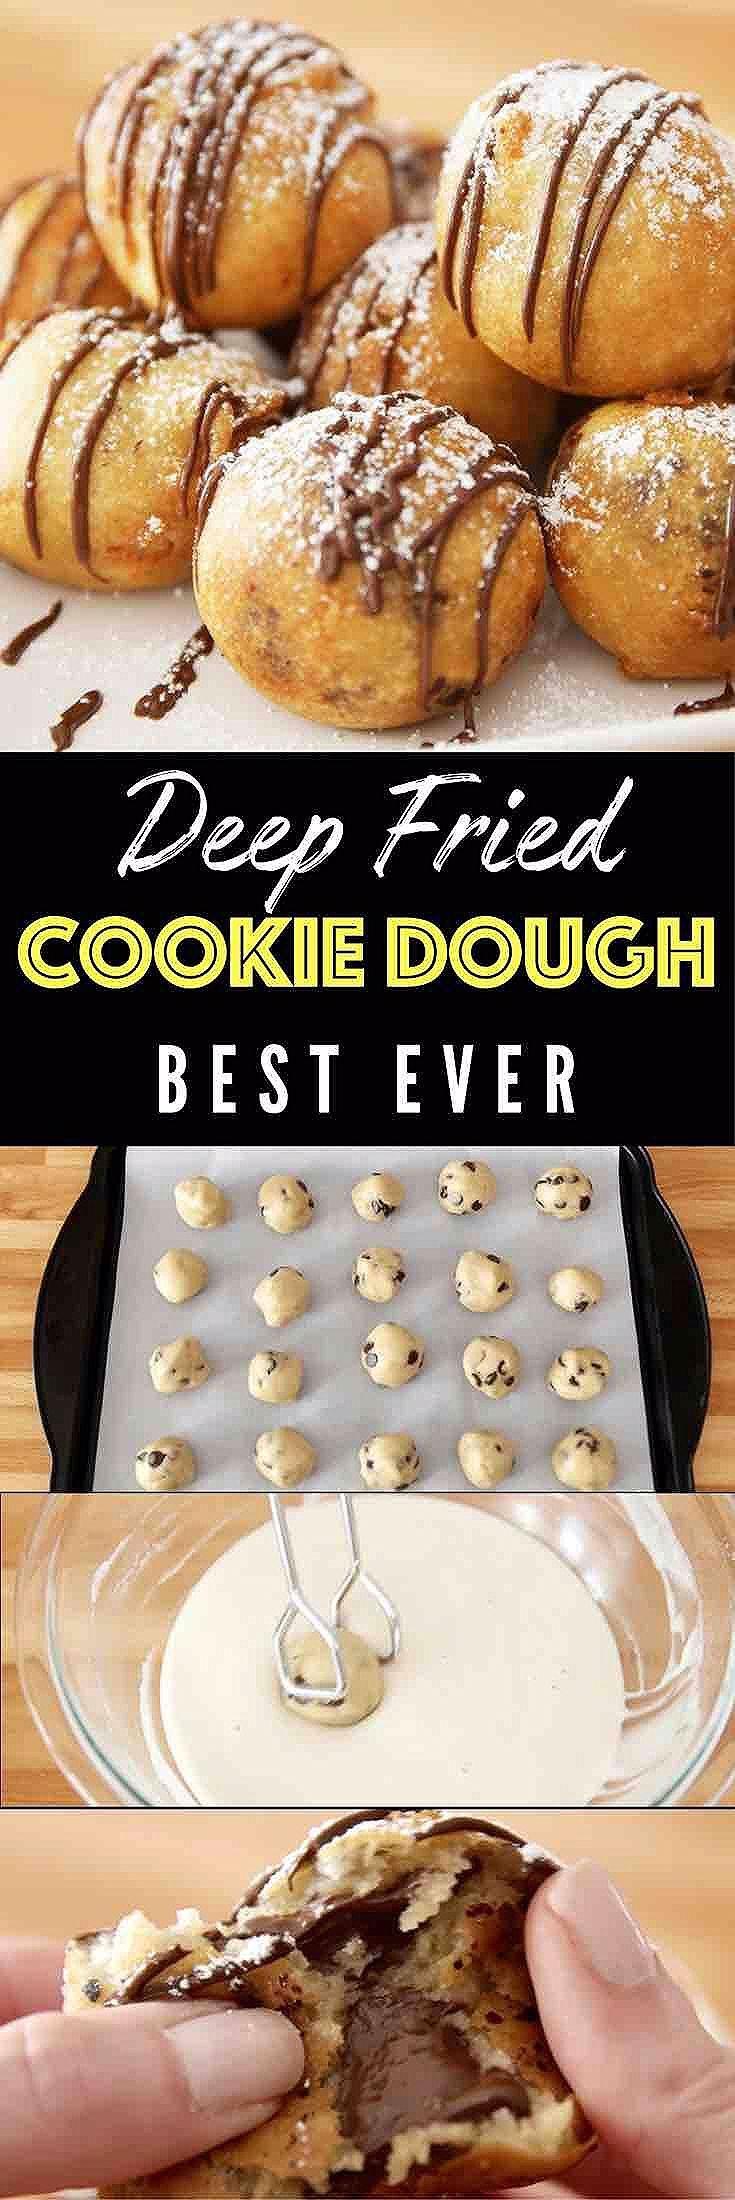 Photo of Deep Fried Cookie Dough – TipBuzz